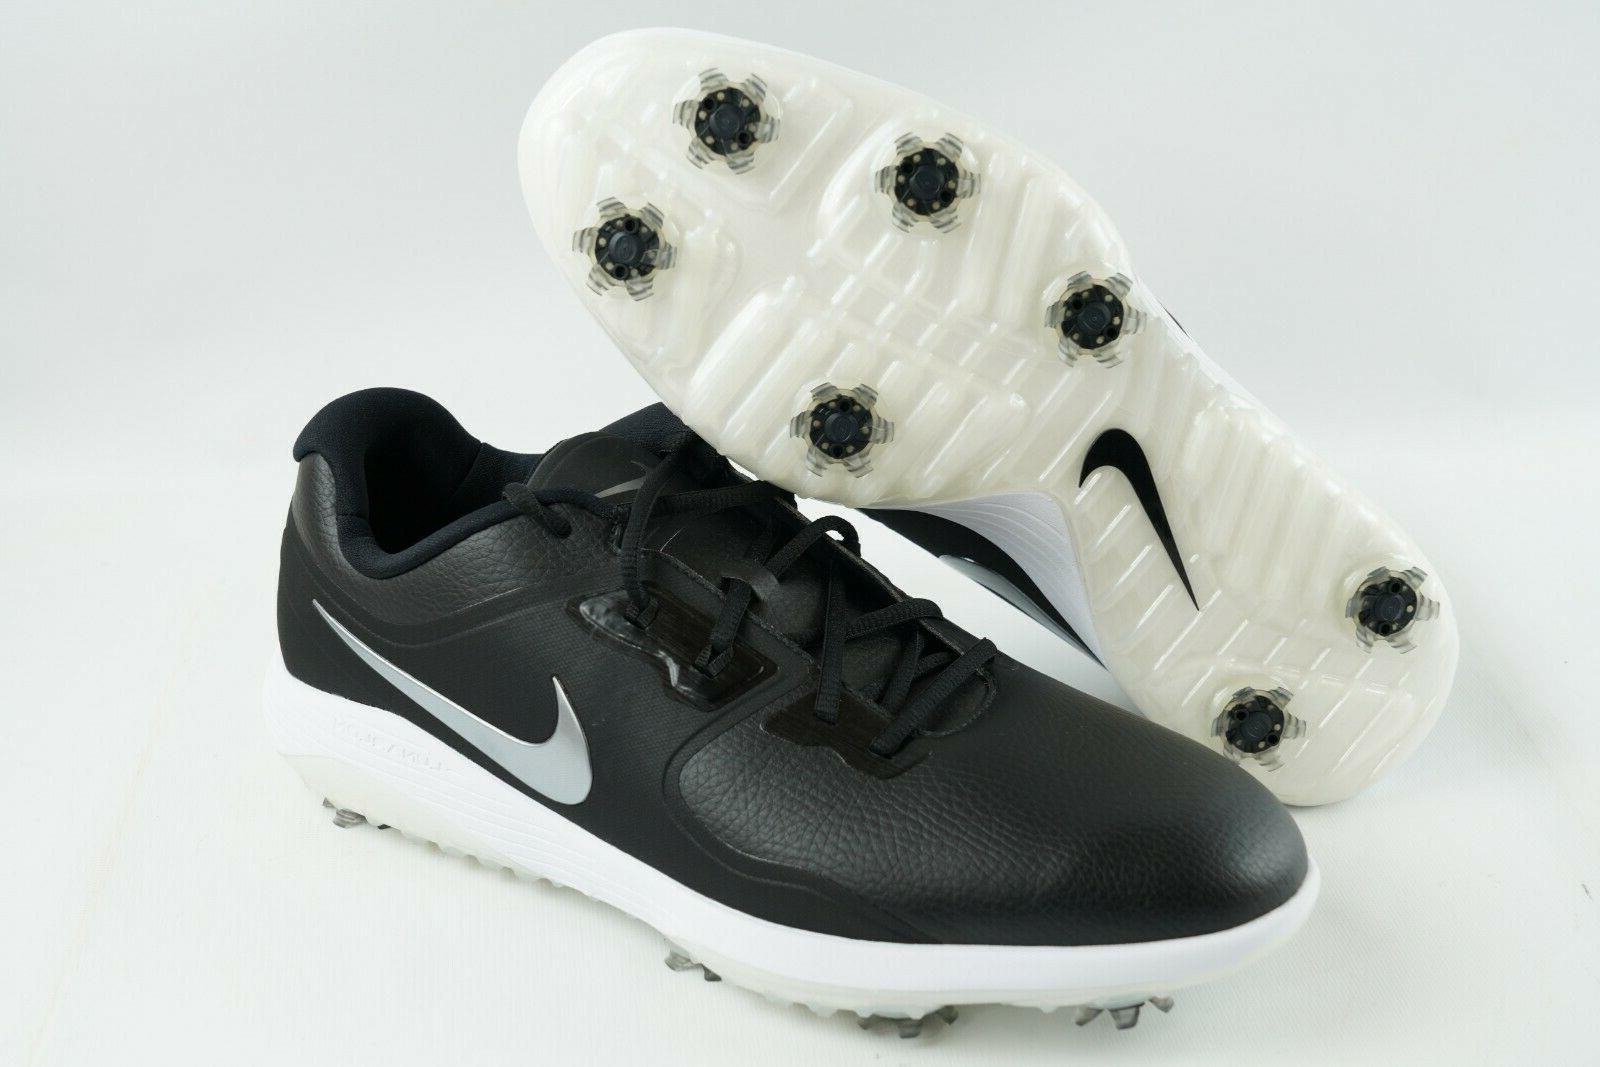 Nike Vapor Pro Shoes Waterproof White AQ2197-001 Men's 14